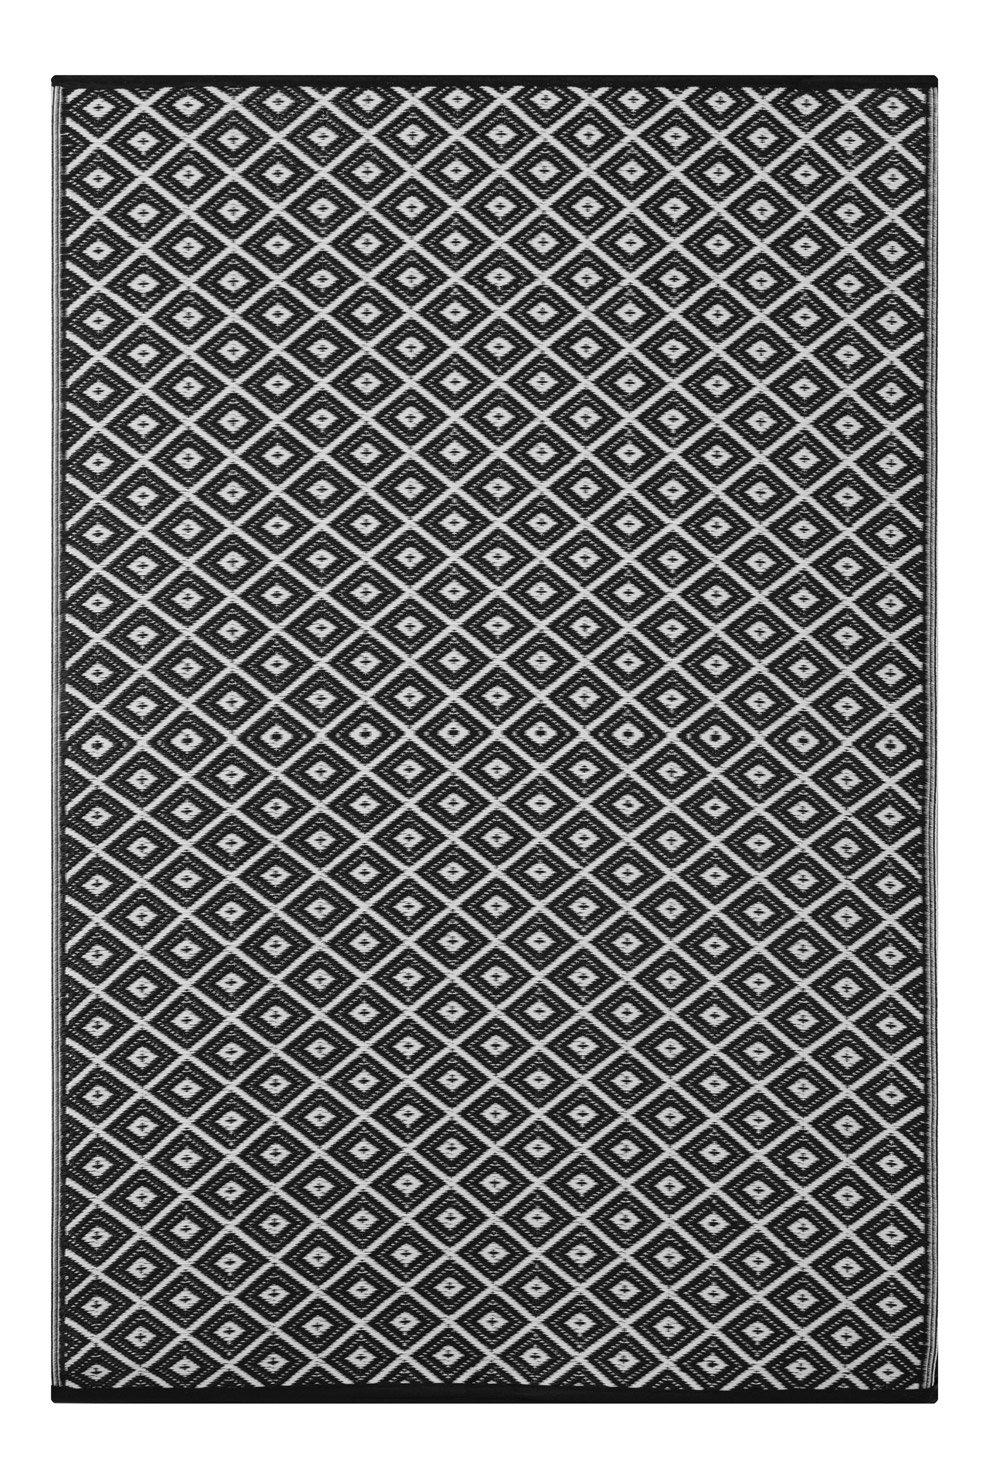 Lightweight Outdoor Reversible Plastic Rug Arabian nights Black / White - 150 cm x 240 cm (5ft x 8ft) by Green Decore